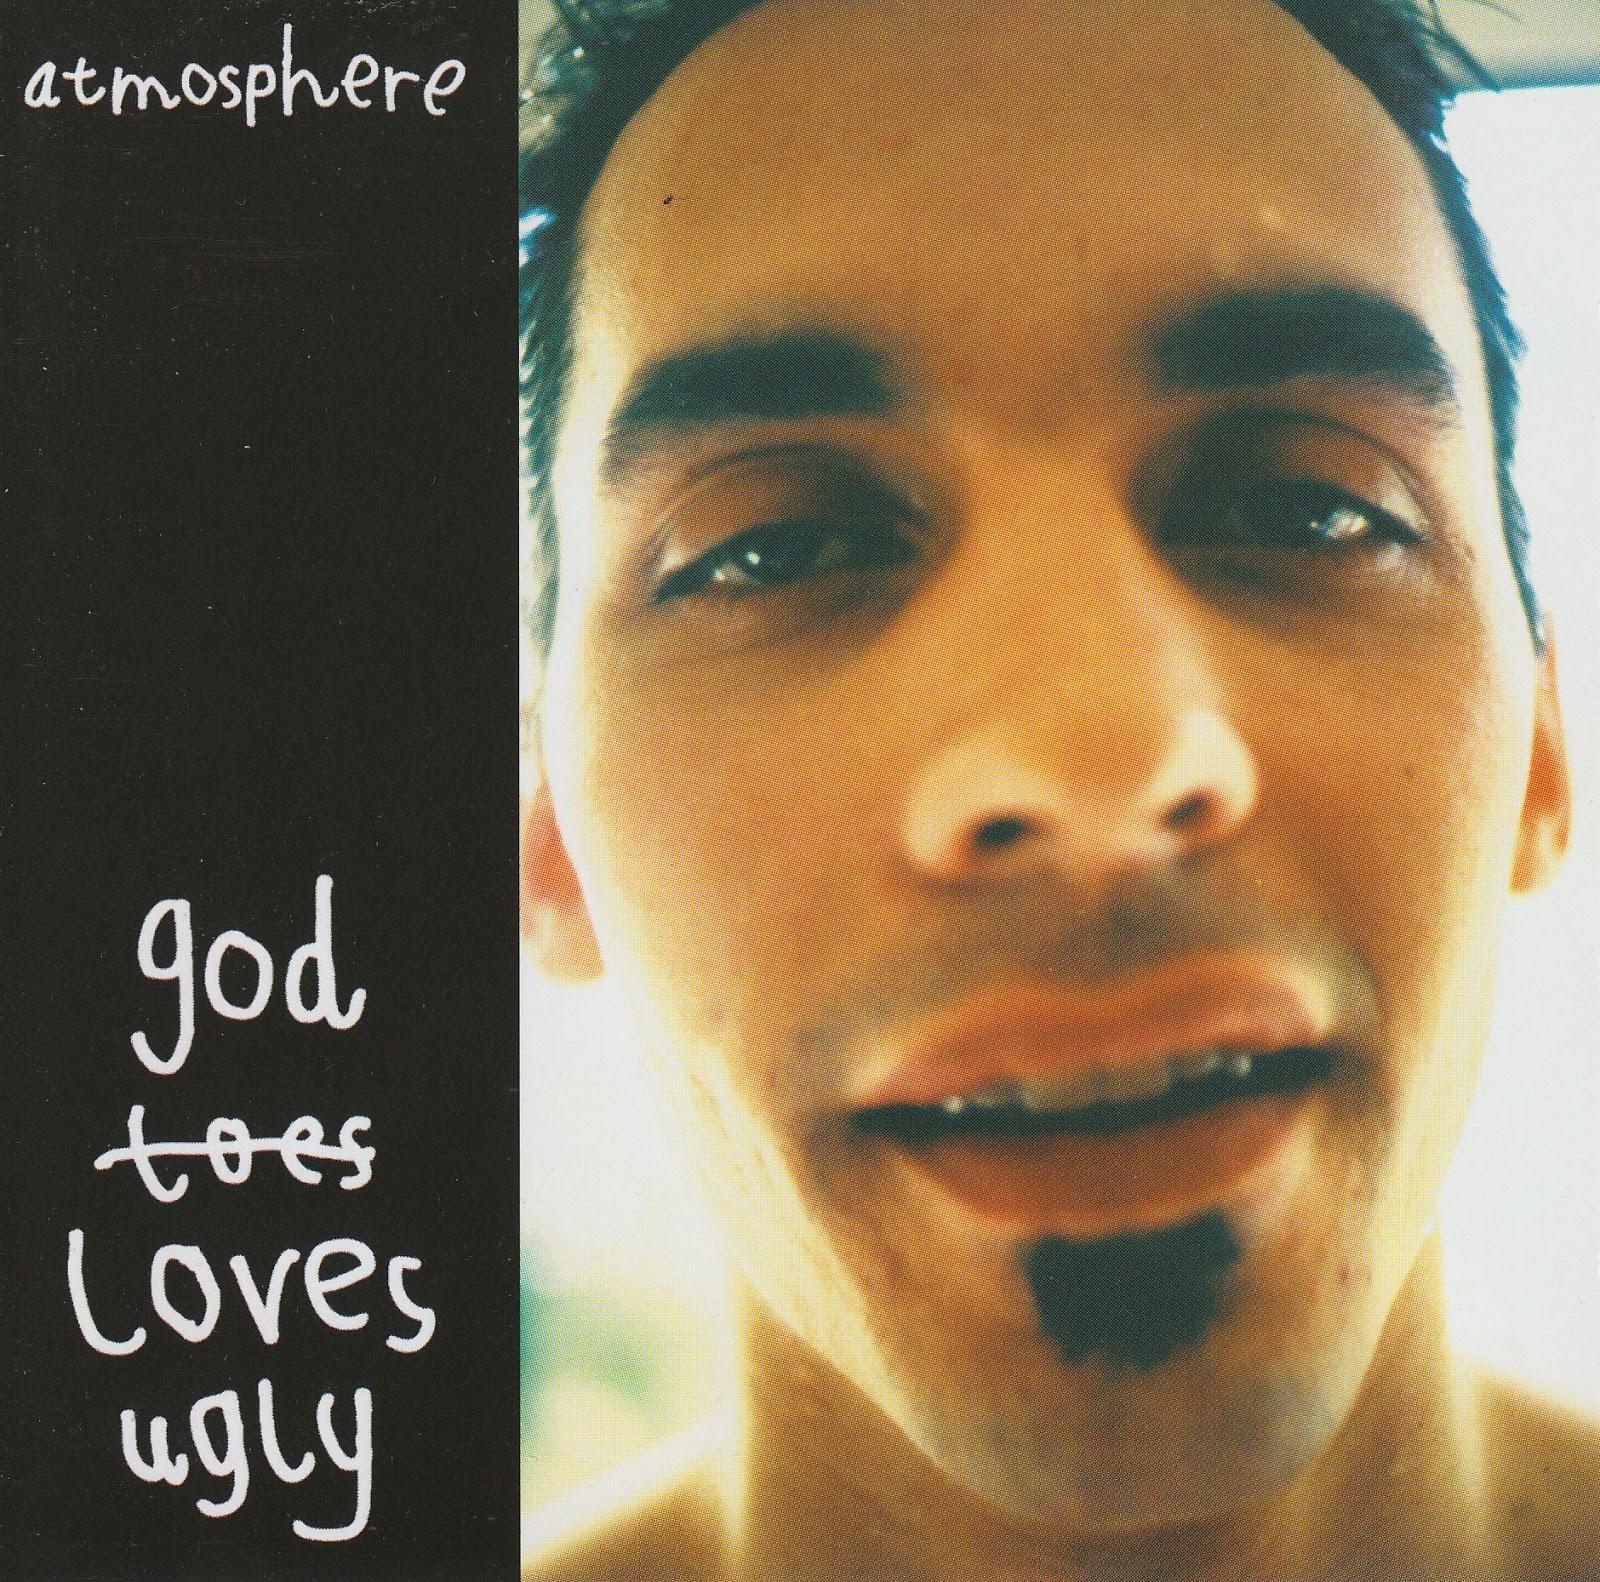 http://1.bp.blogspot.com/-KpeS2XOM-Lk/Uc8BUmEZAYI/AAAAAAAAG-8/l2pMkn0P9mY/s1600/00-atmosphere-god_loves_ugly-2002-bbh_int-1.jpg